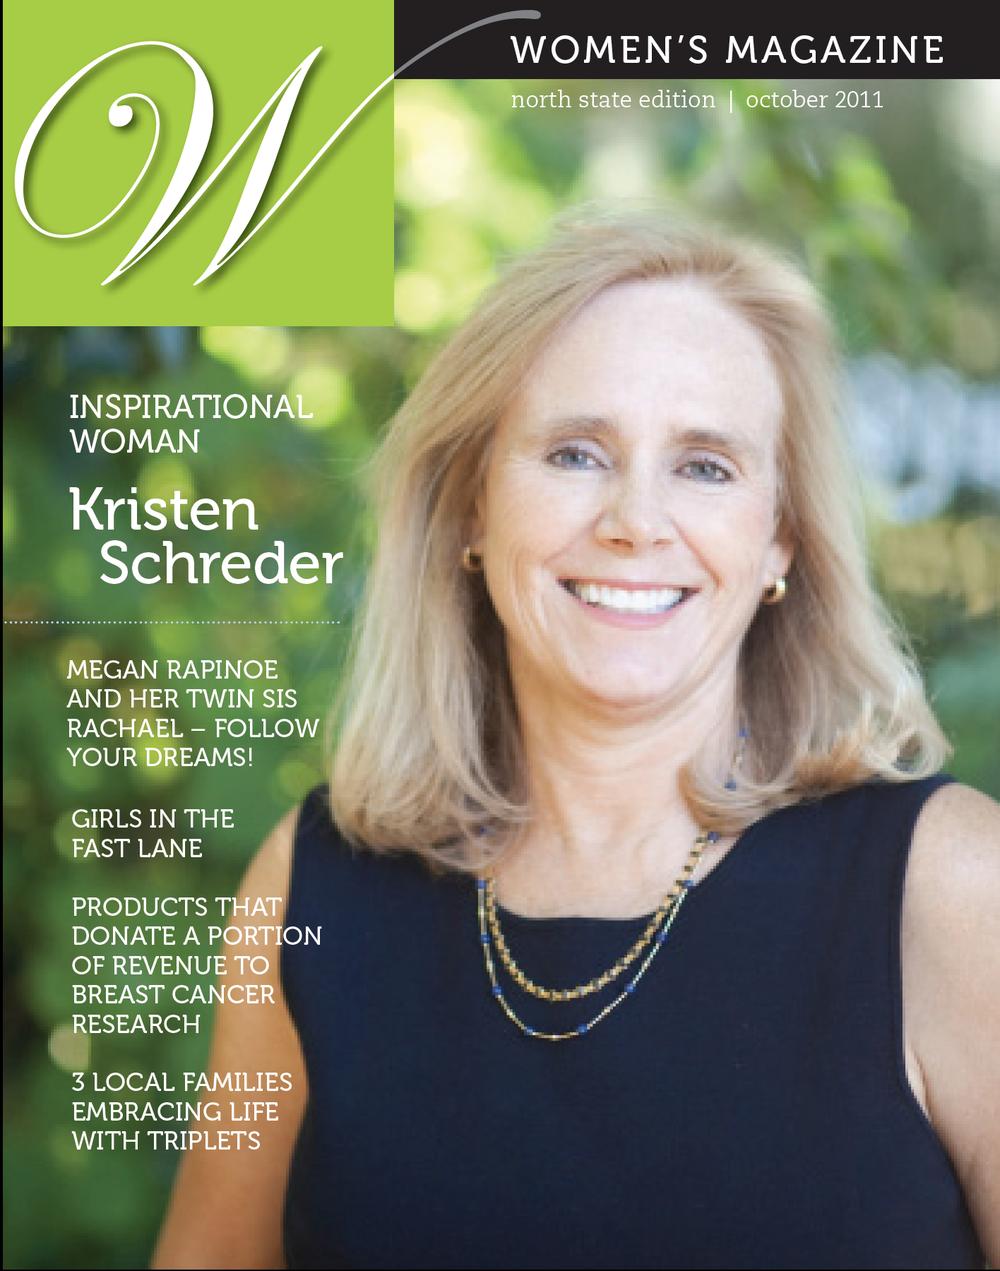 Women's Magazine October 2011